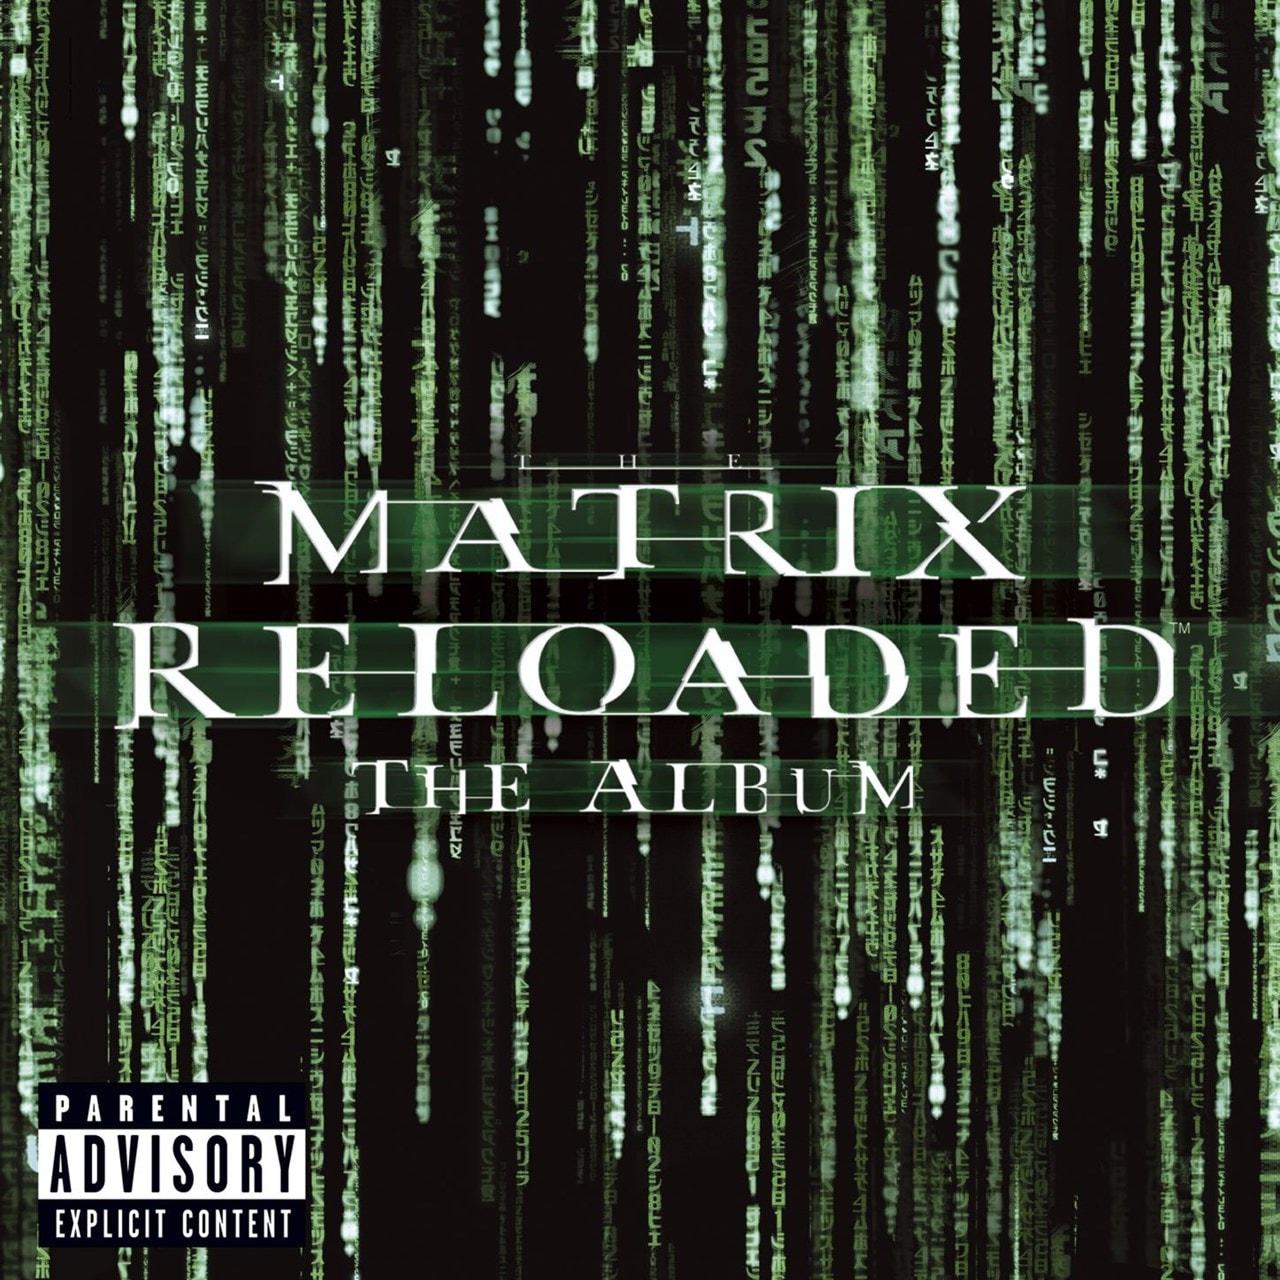 The Matrix: Reloaded: The Album - 1